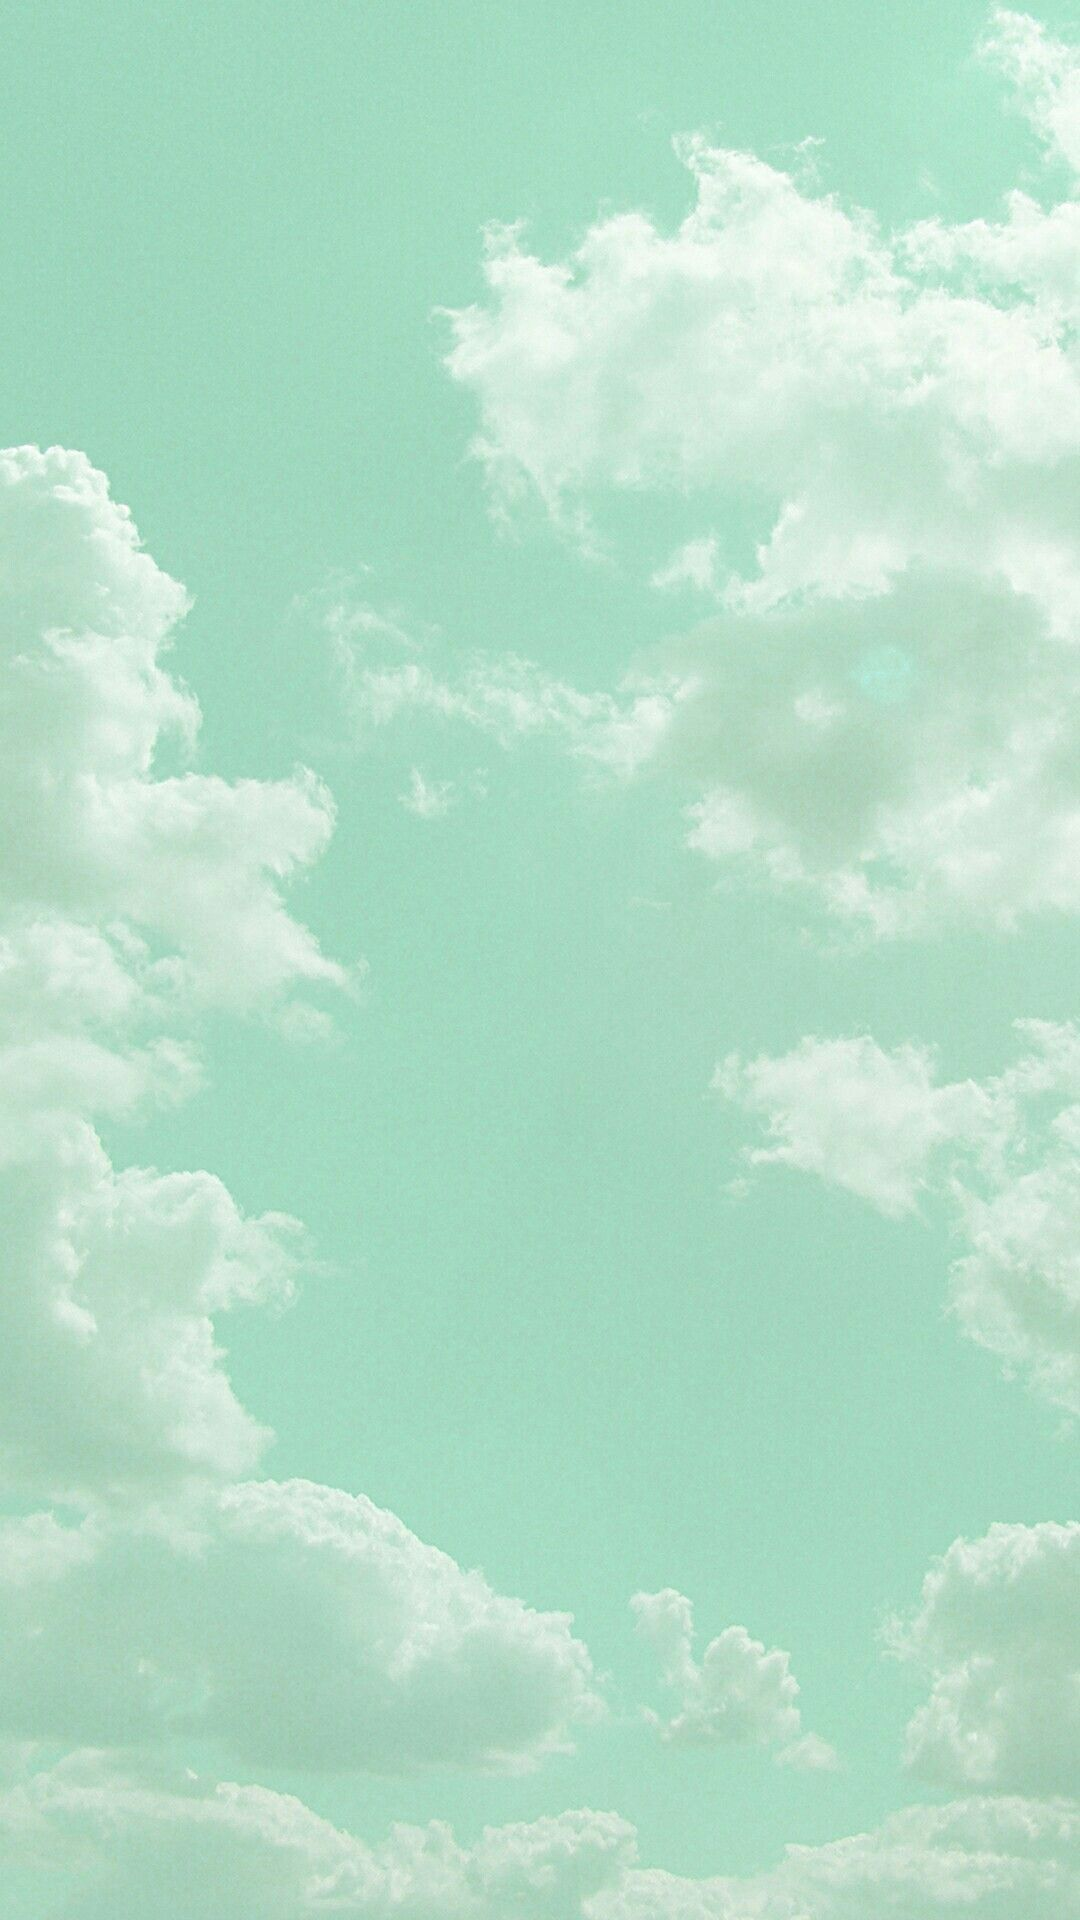 Sophie Mint Green Wallpaper Mint Green Aesthetic Green Wallpaper Aesthetic mint green clouds wallpaper